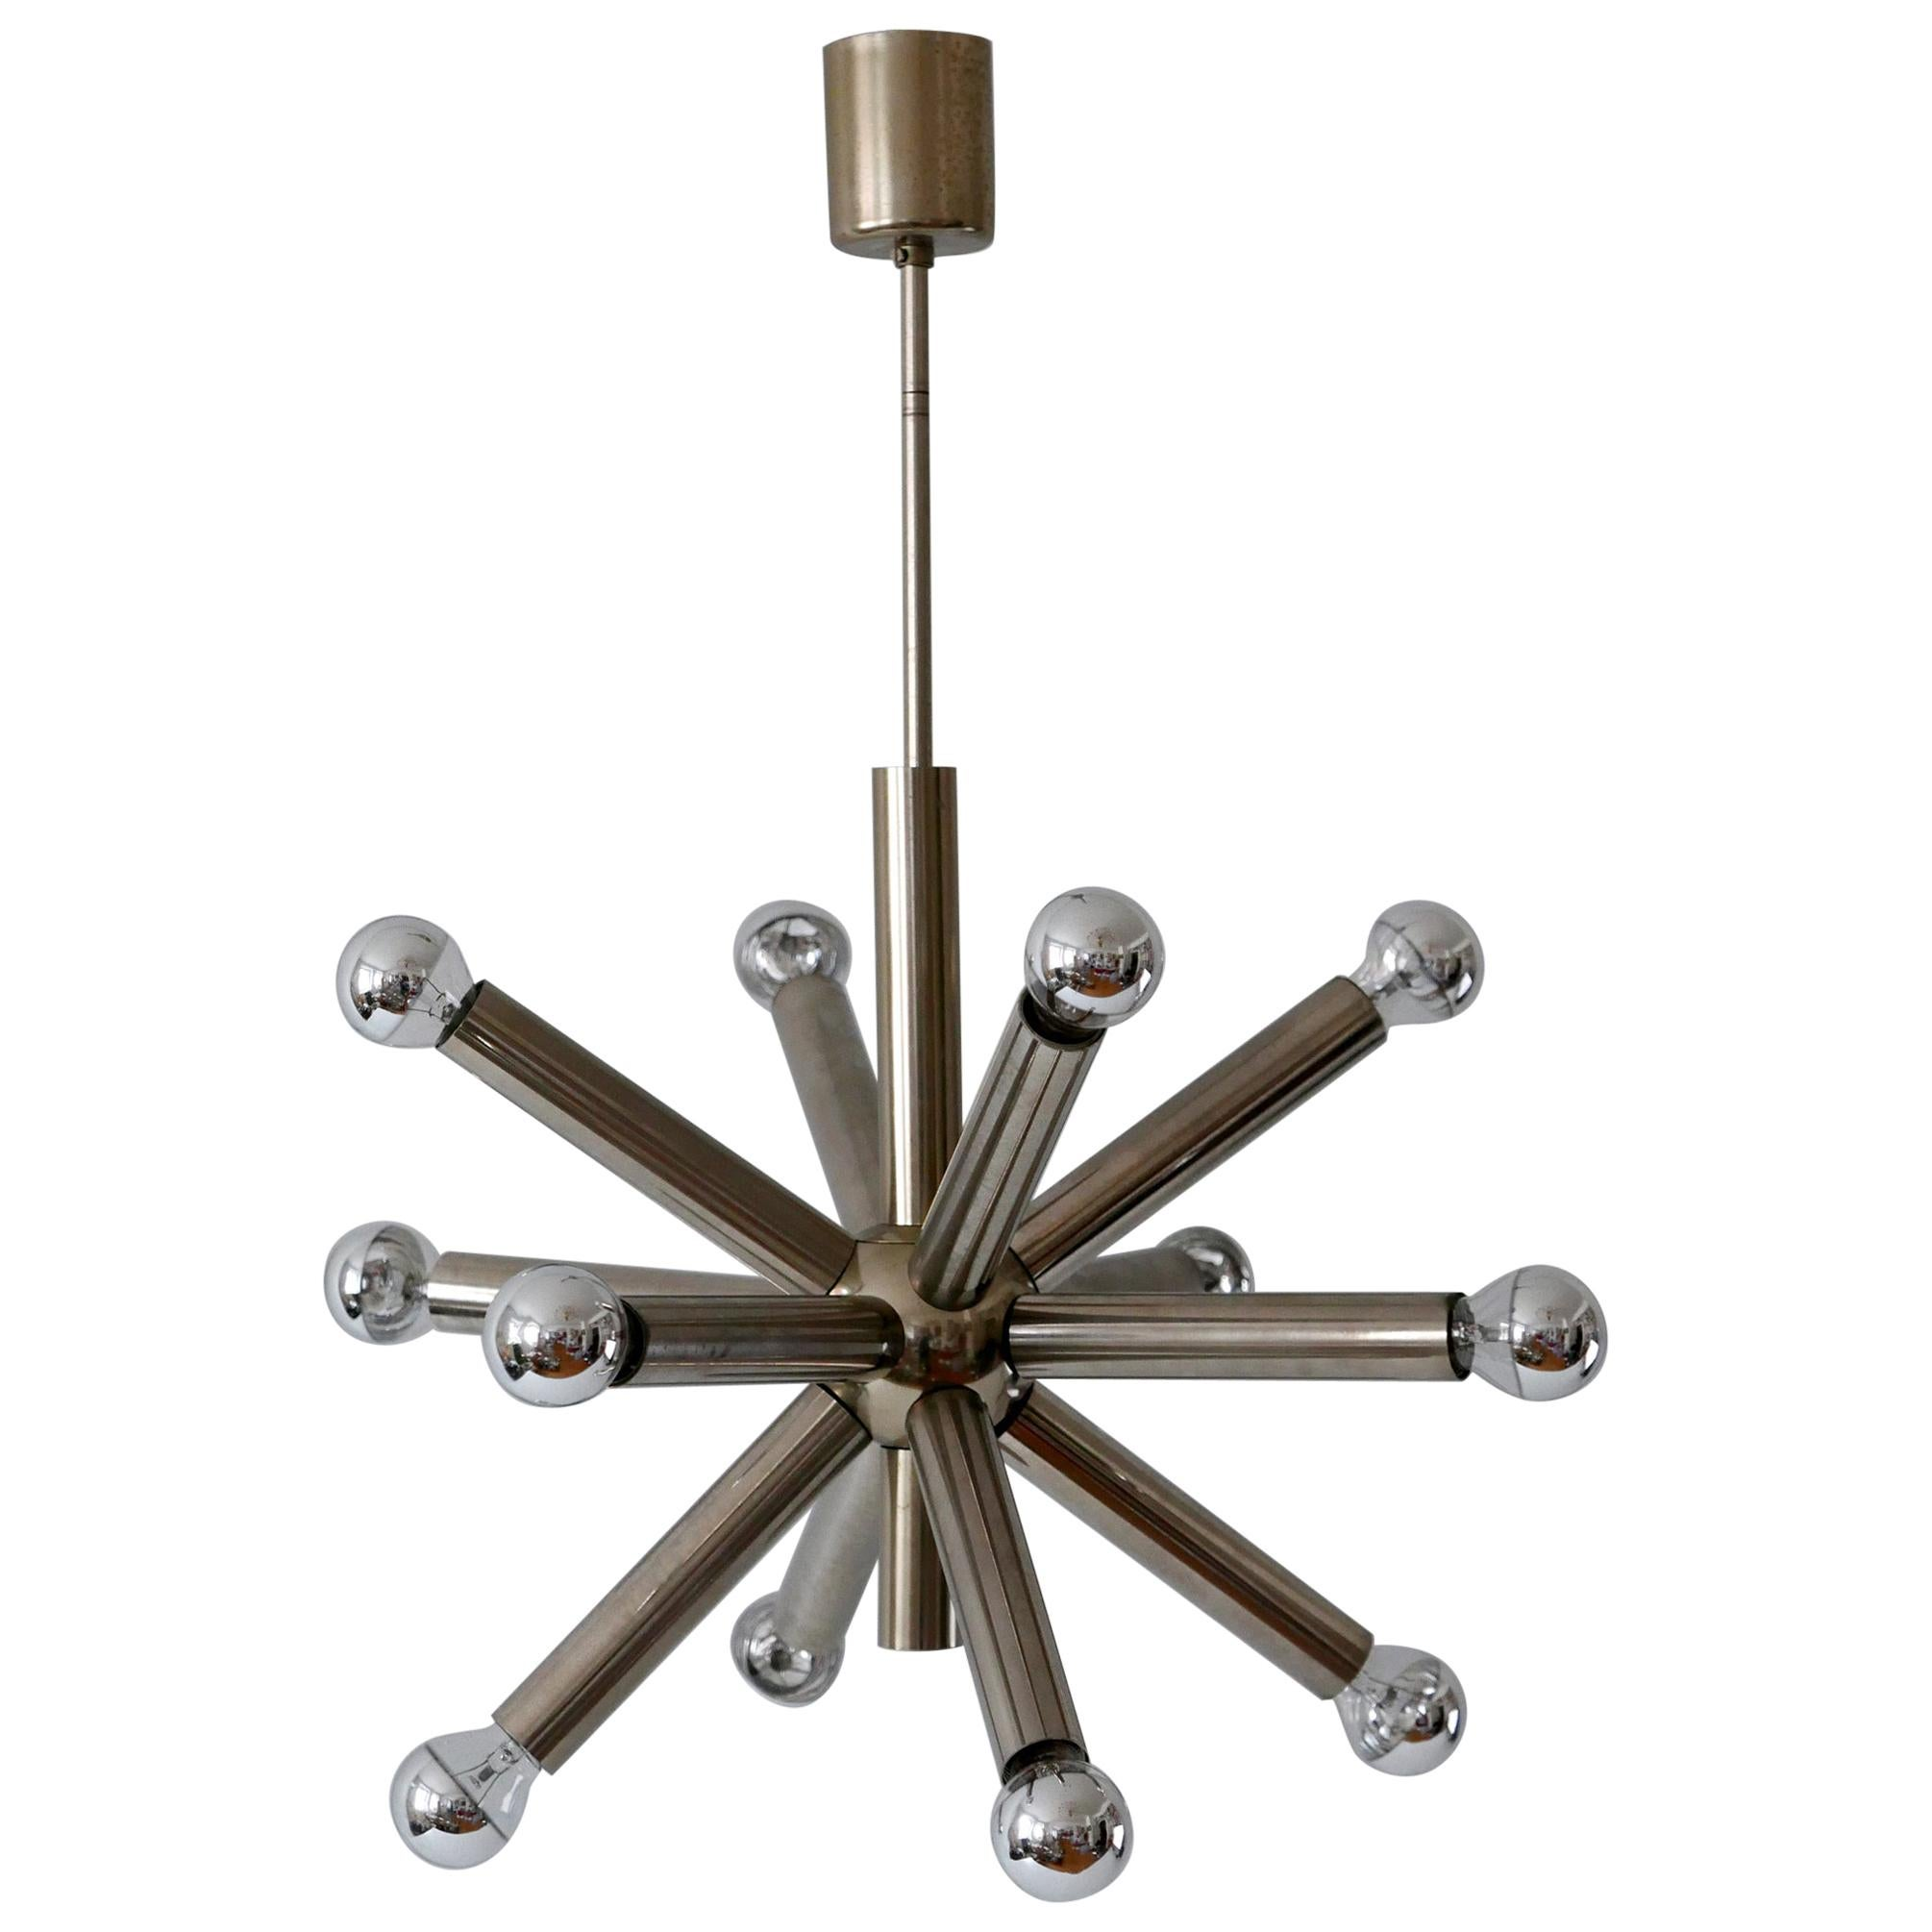 12-Armed Mid-Century Modern Sputnik Chandelier or Pendant Lamp, 1960s, Germany